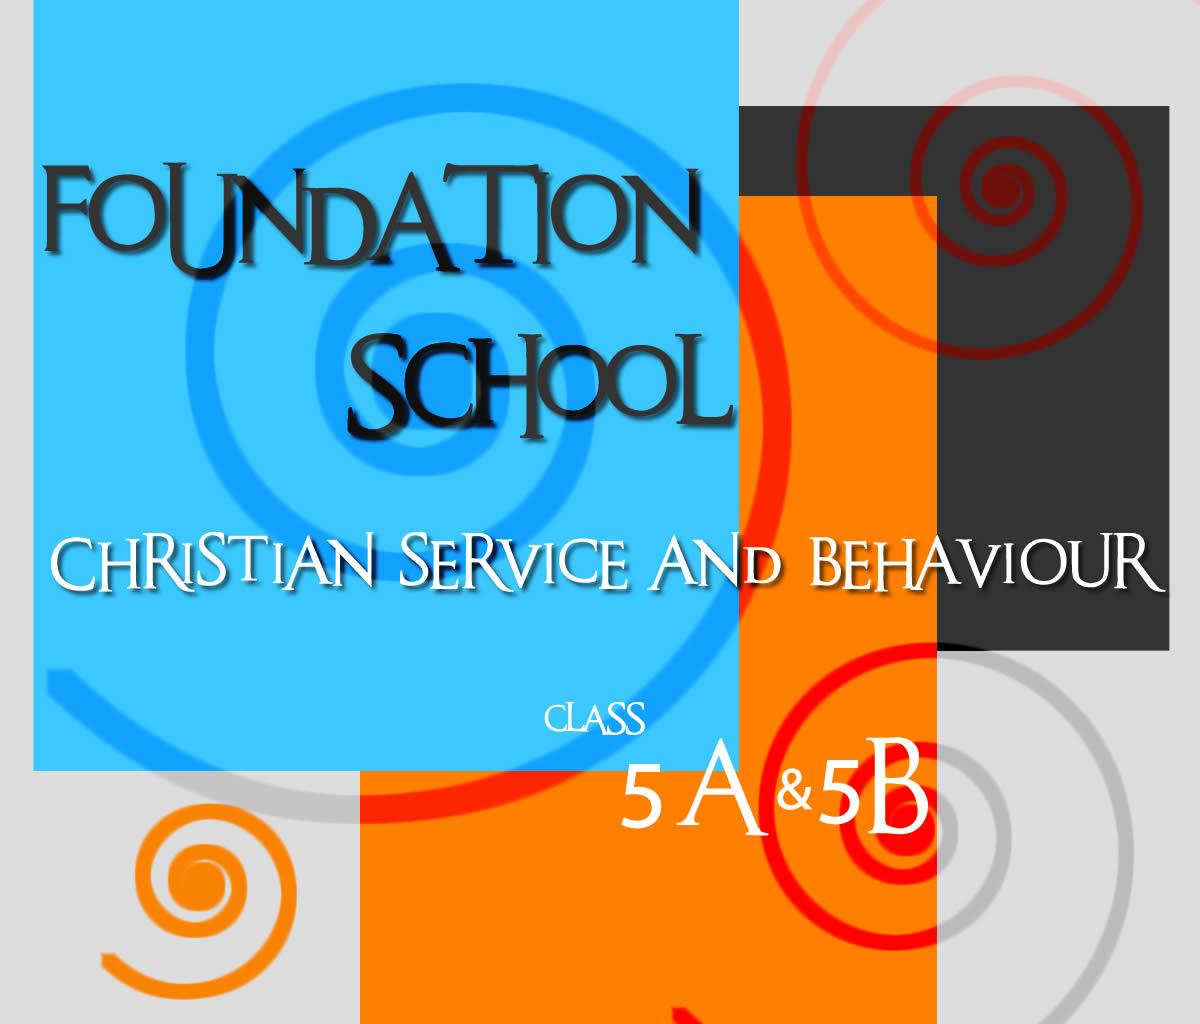 FOUNDATION SCHOOL CLASS 5